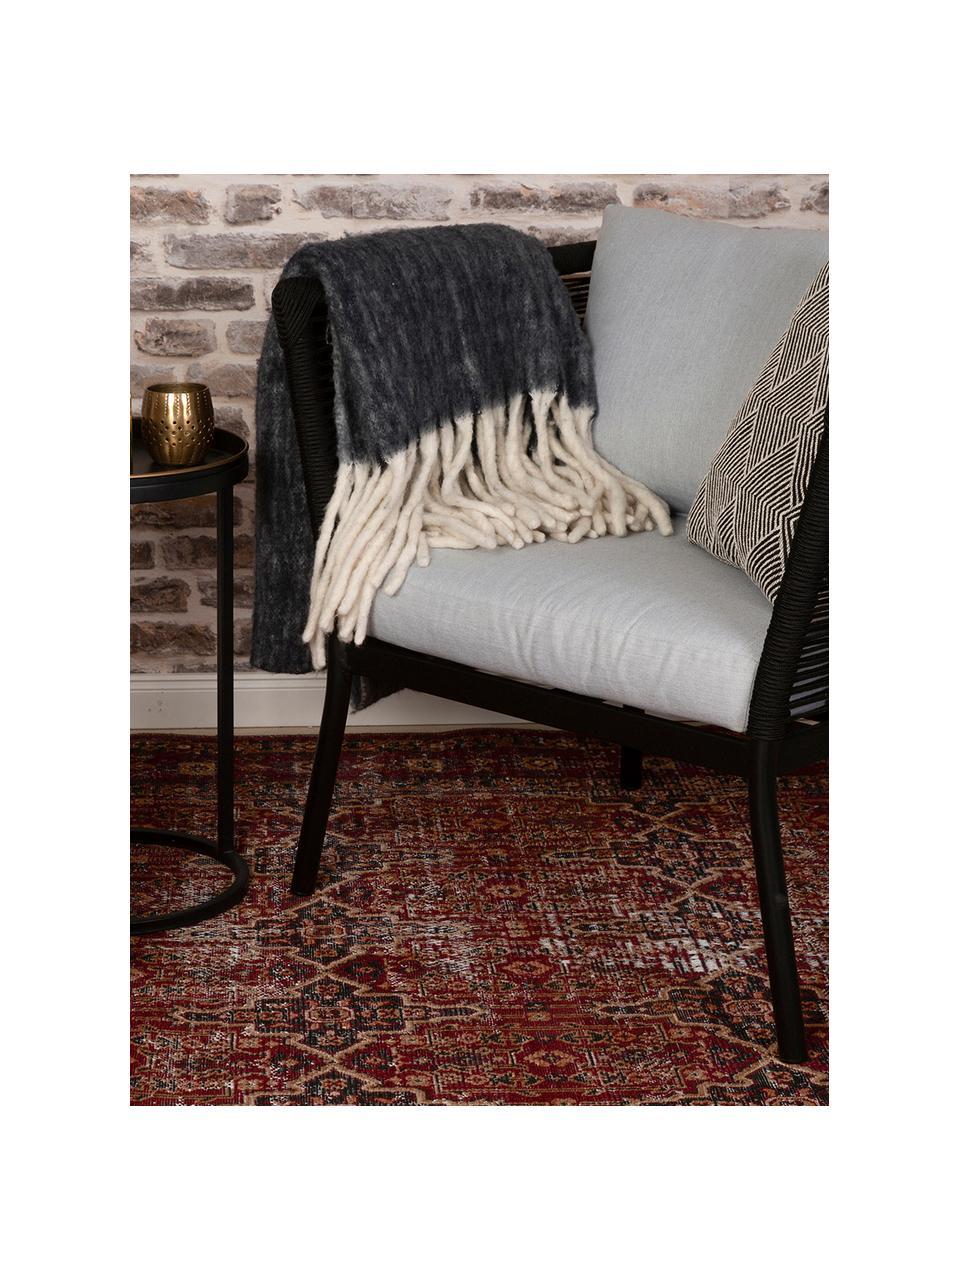 In- & Outdoor-Teppich Tilas Izmir in Dunkelrot, Orient Style, Dunkelrot, Senfgelb, Khaki, B 200 x L 290 cm (Größe L)